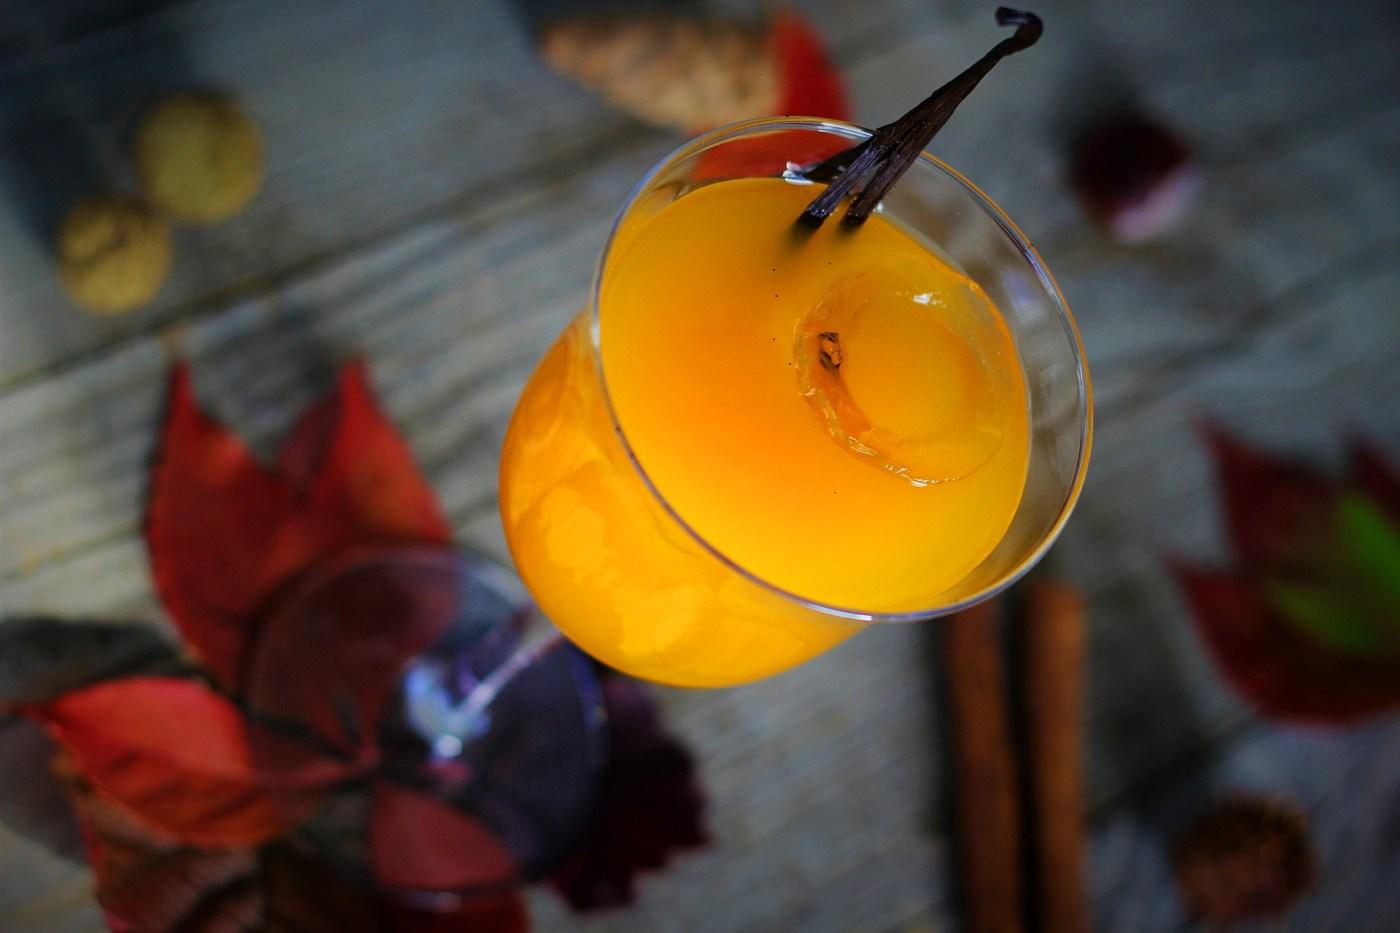 cocktail à la croisette, abidjan, la croisette, serialfoodie